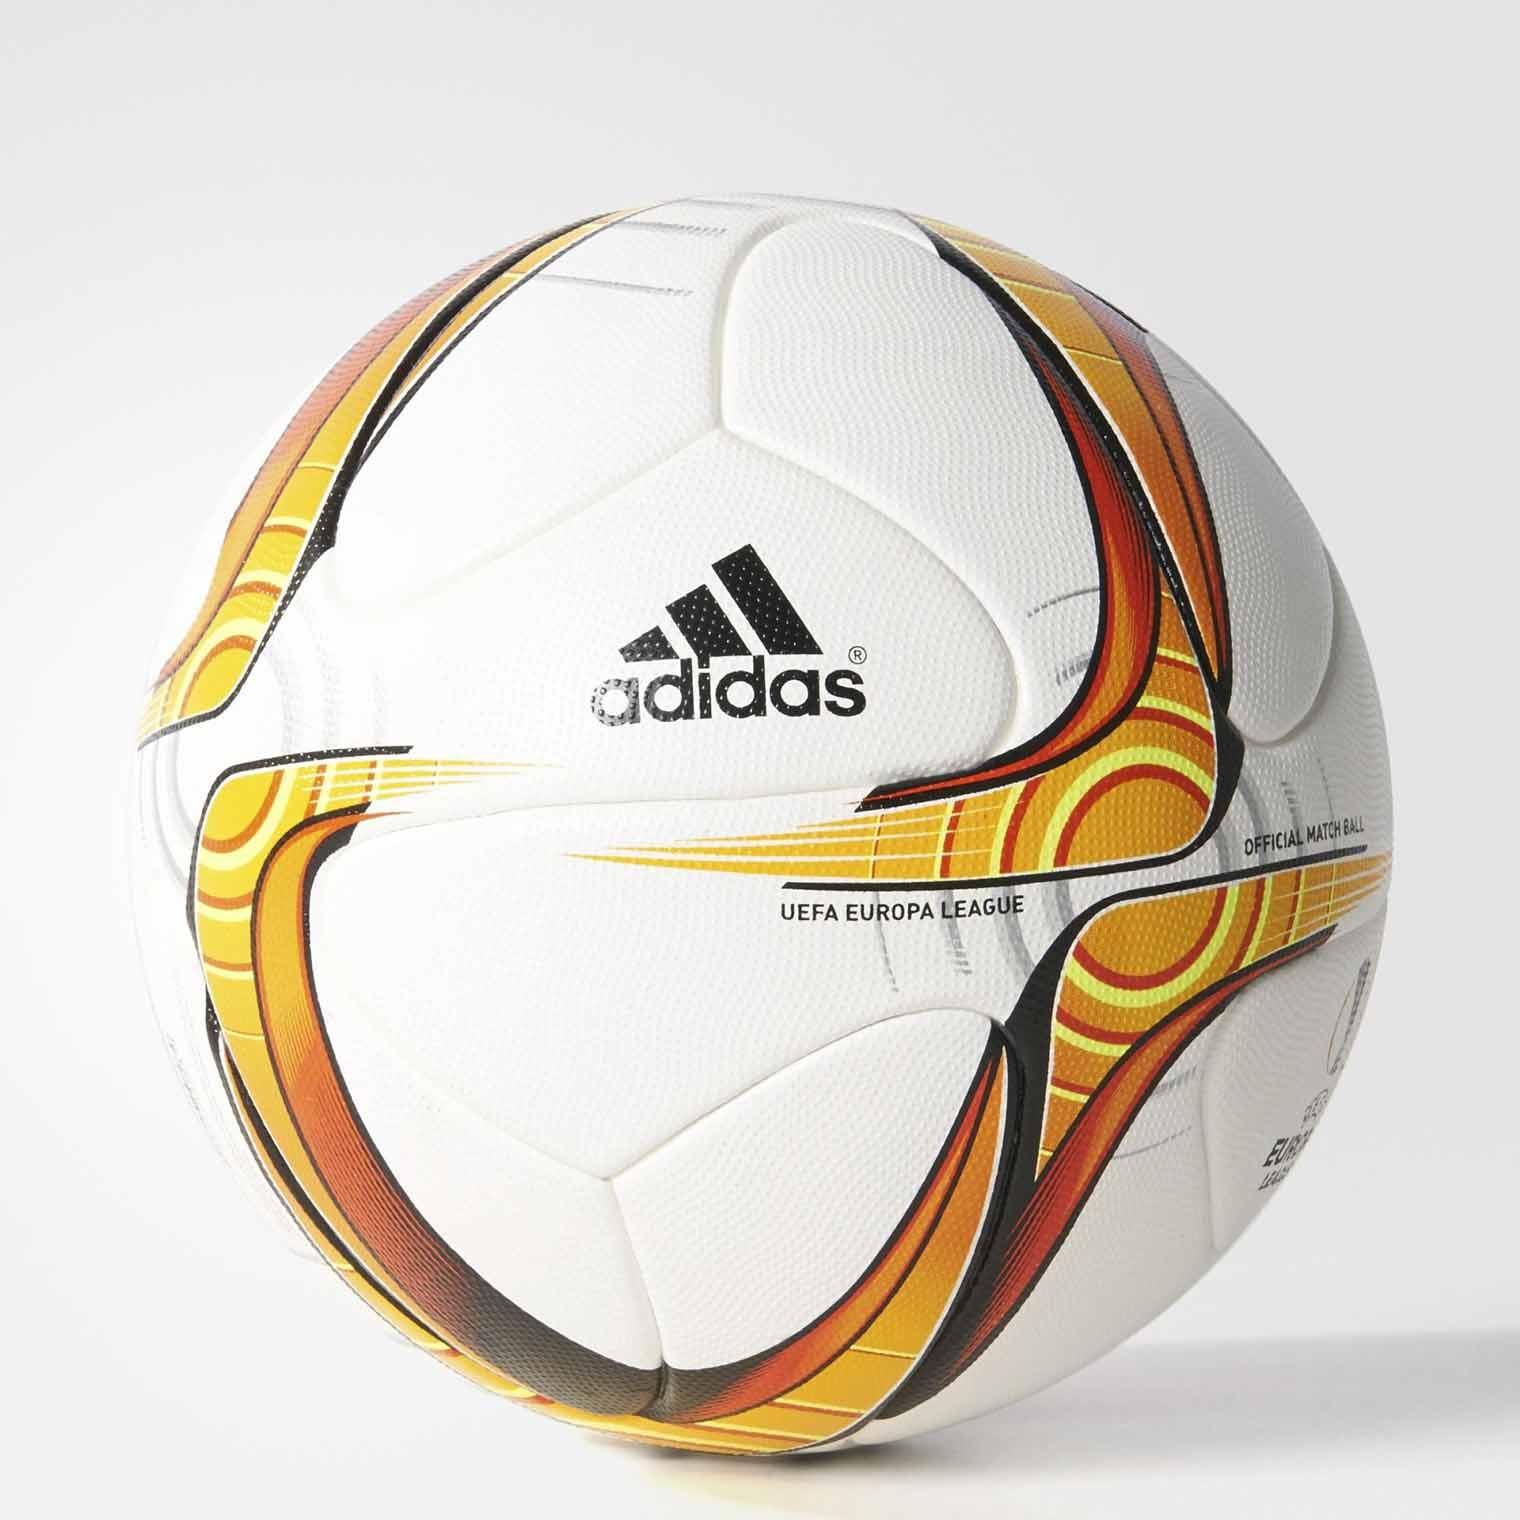 Adidas Europa League 2015-16